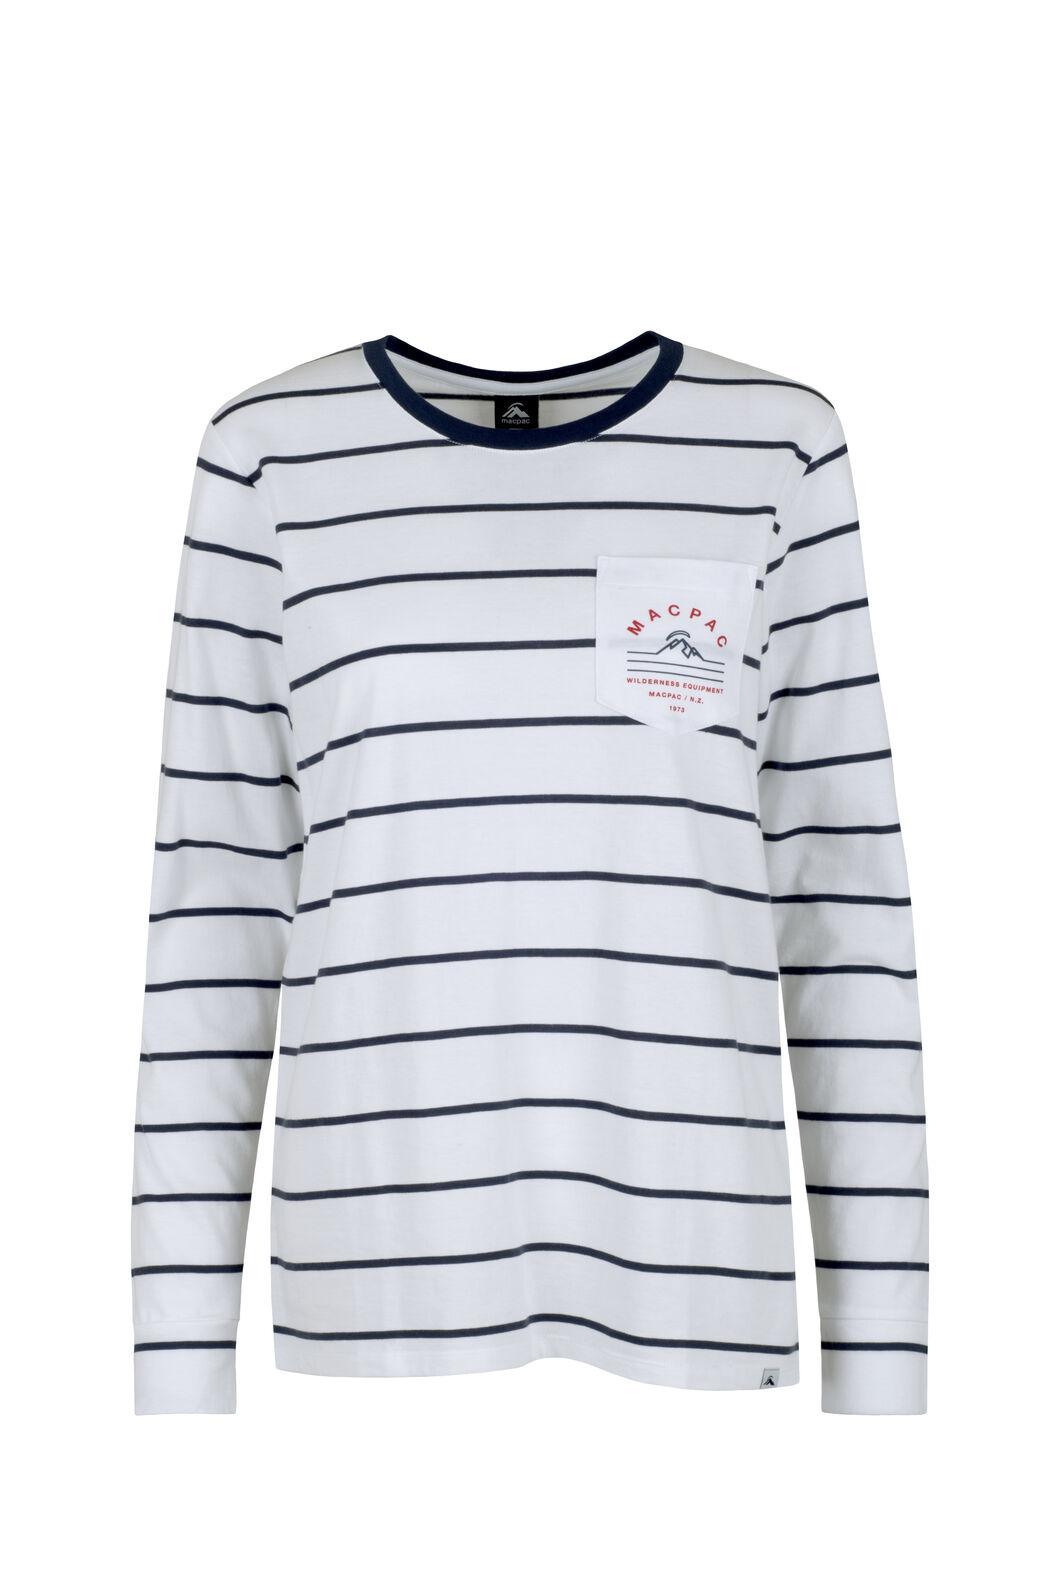 Macpac Alps Organic Long Sleeve Tee — Women's, Mood Indigo/White Stripe, hi-res